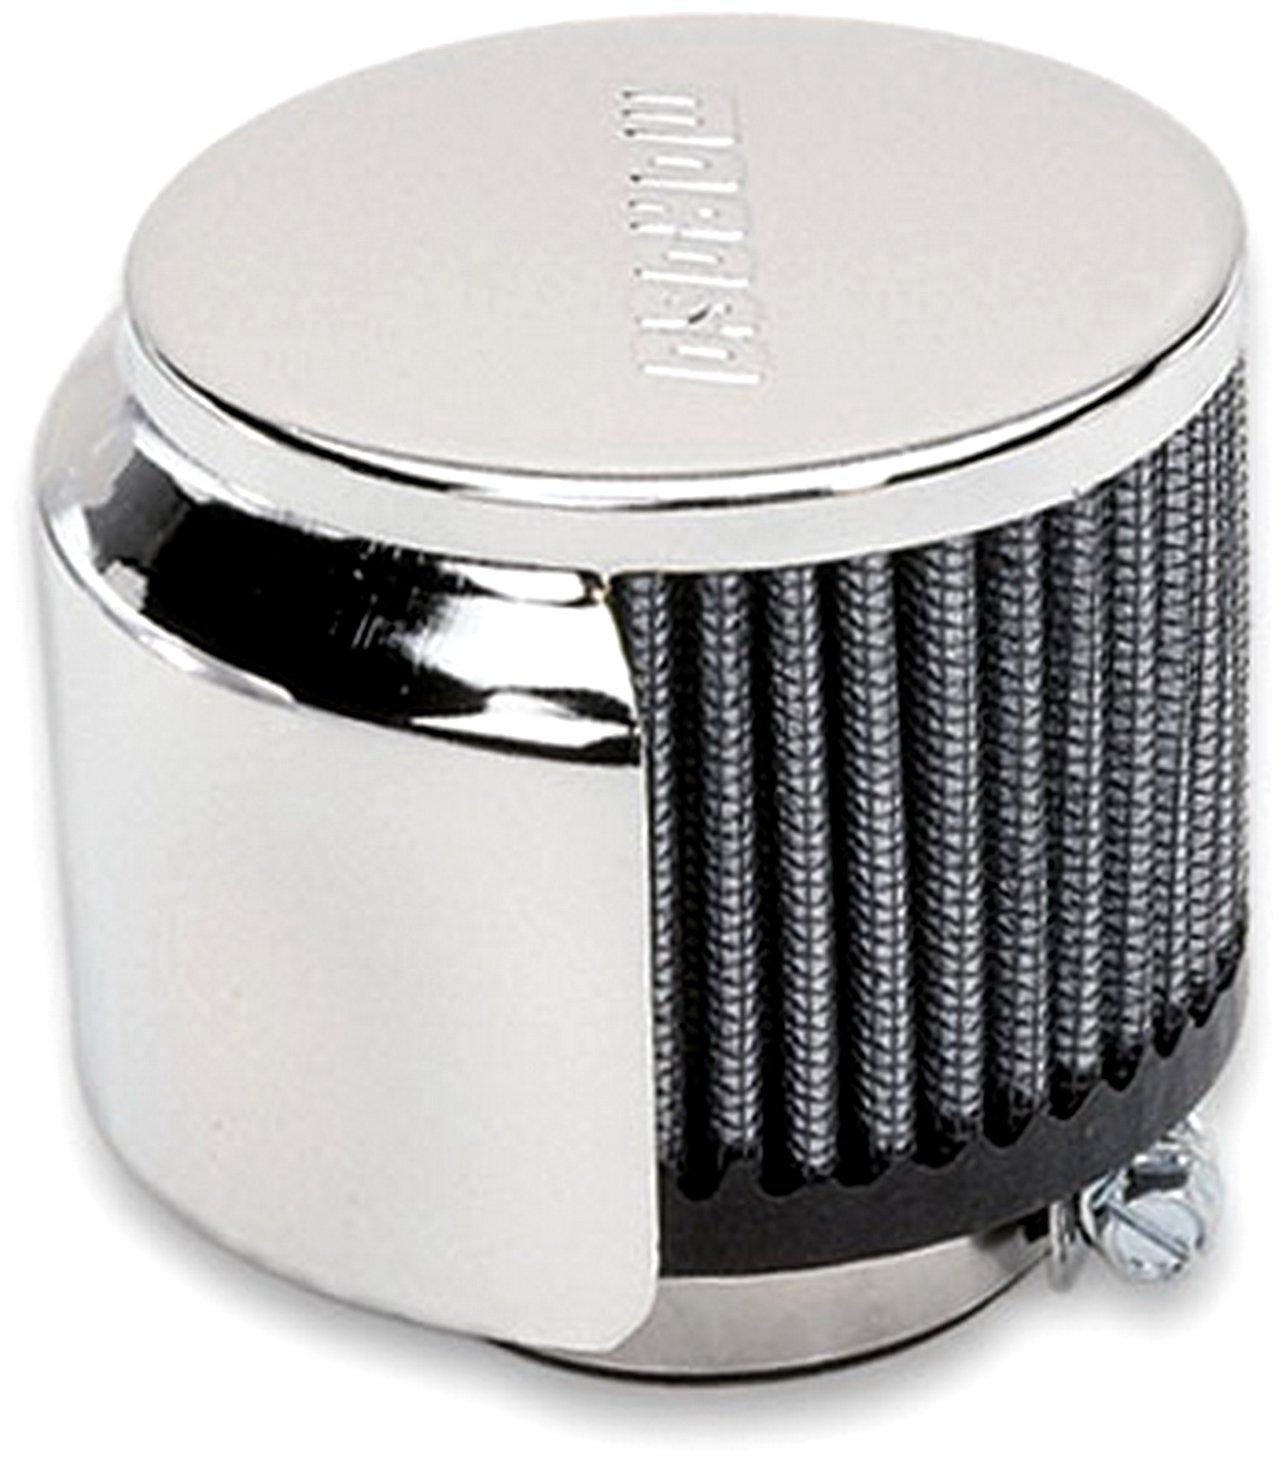 Moroso 68811 Valve Cover Filtered Breather